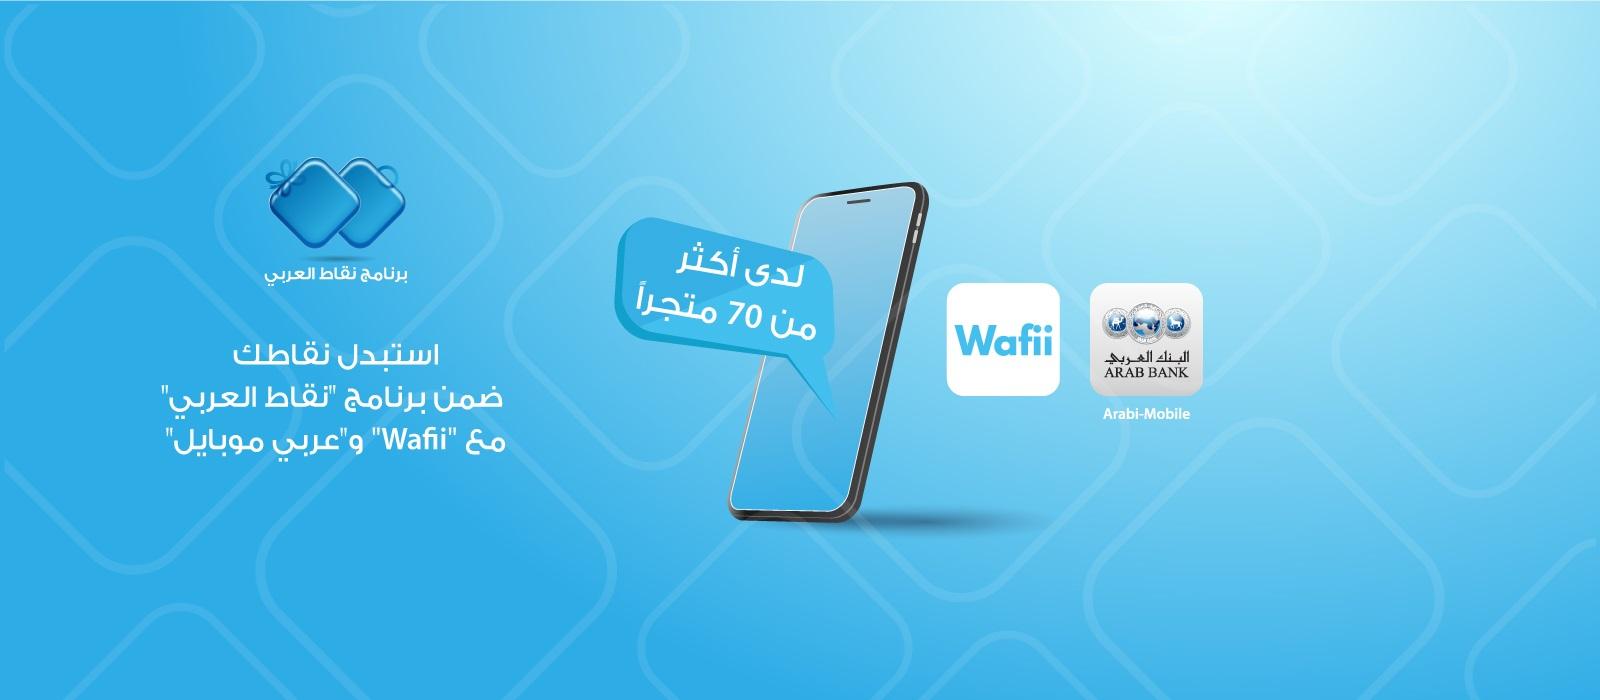 website ar Wafii